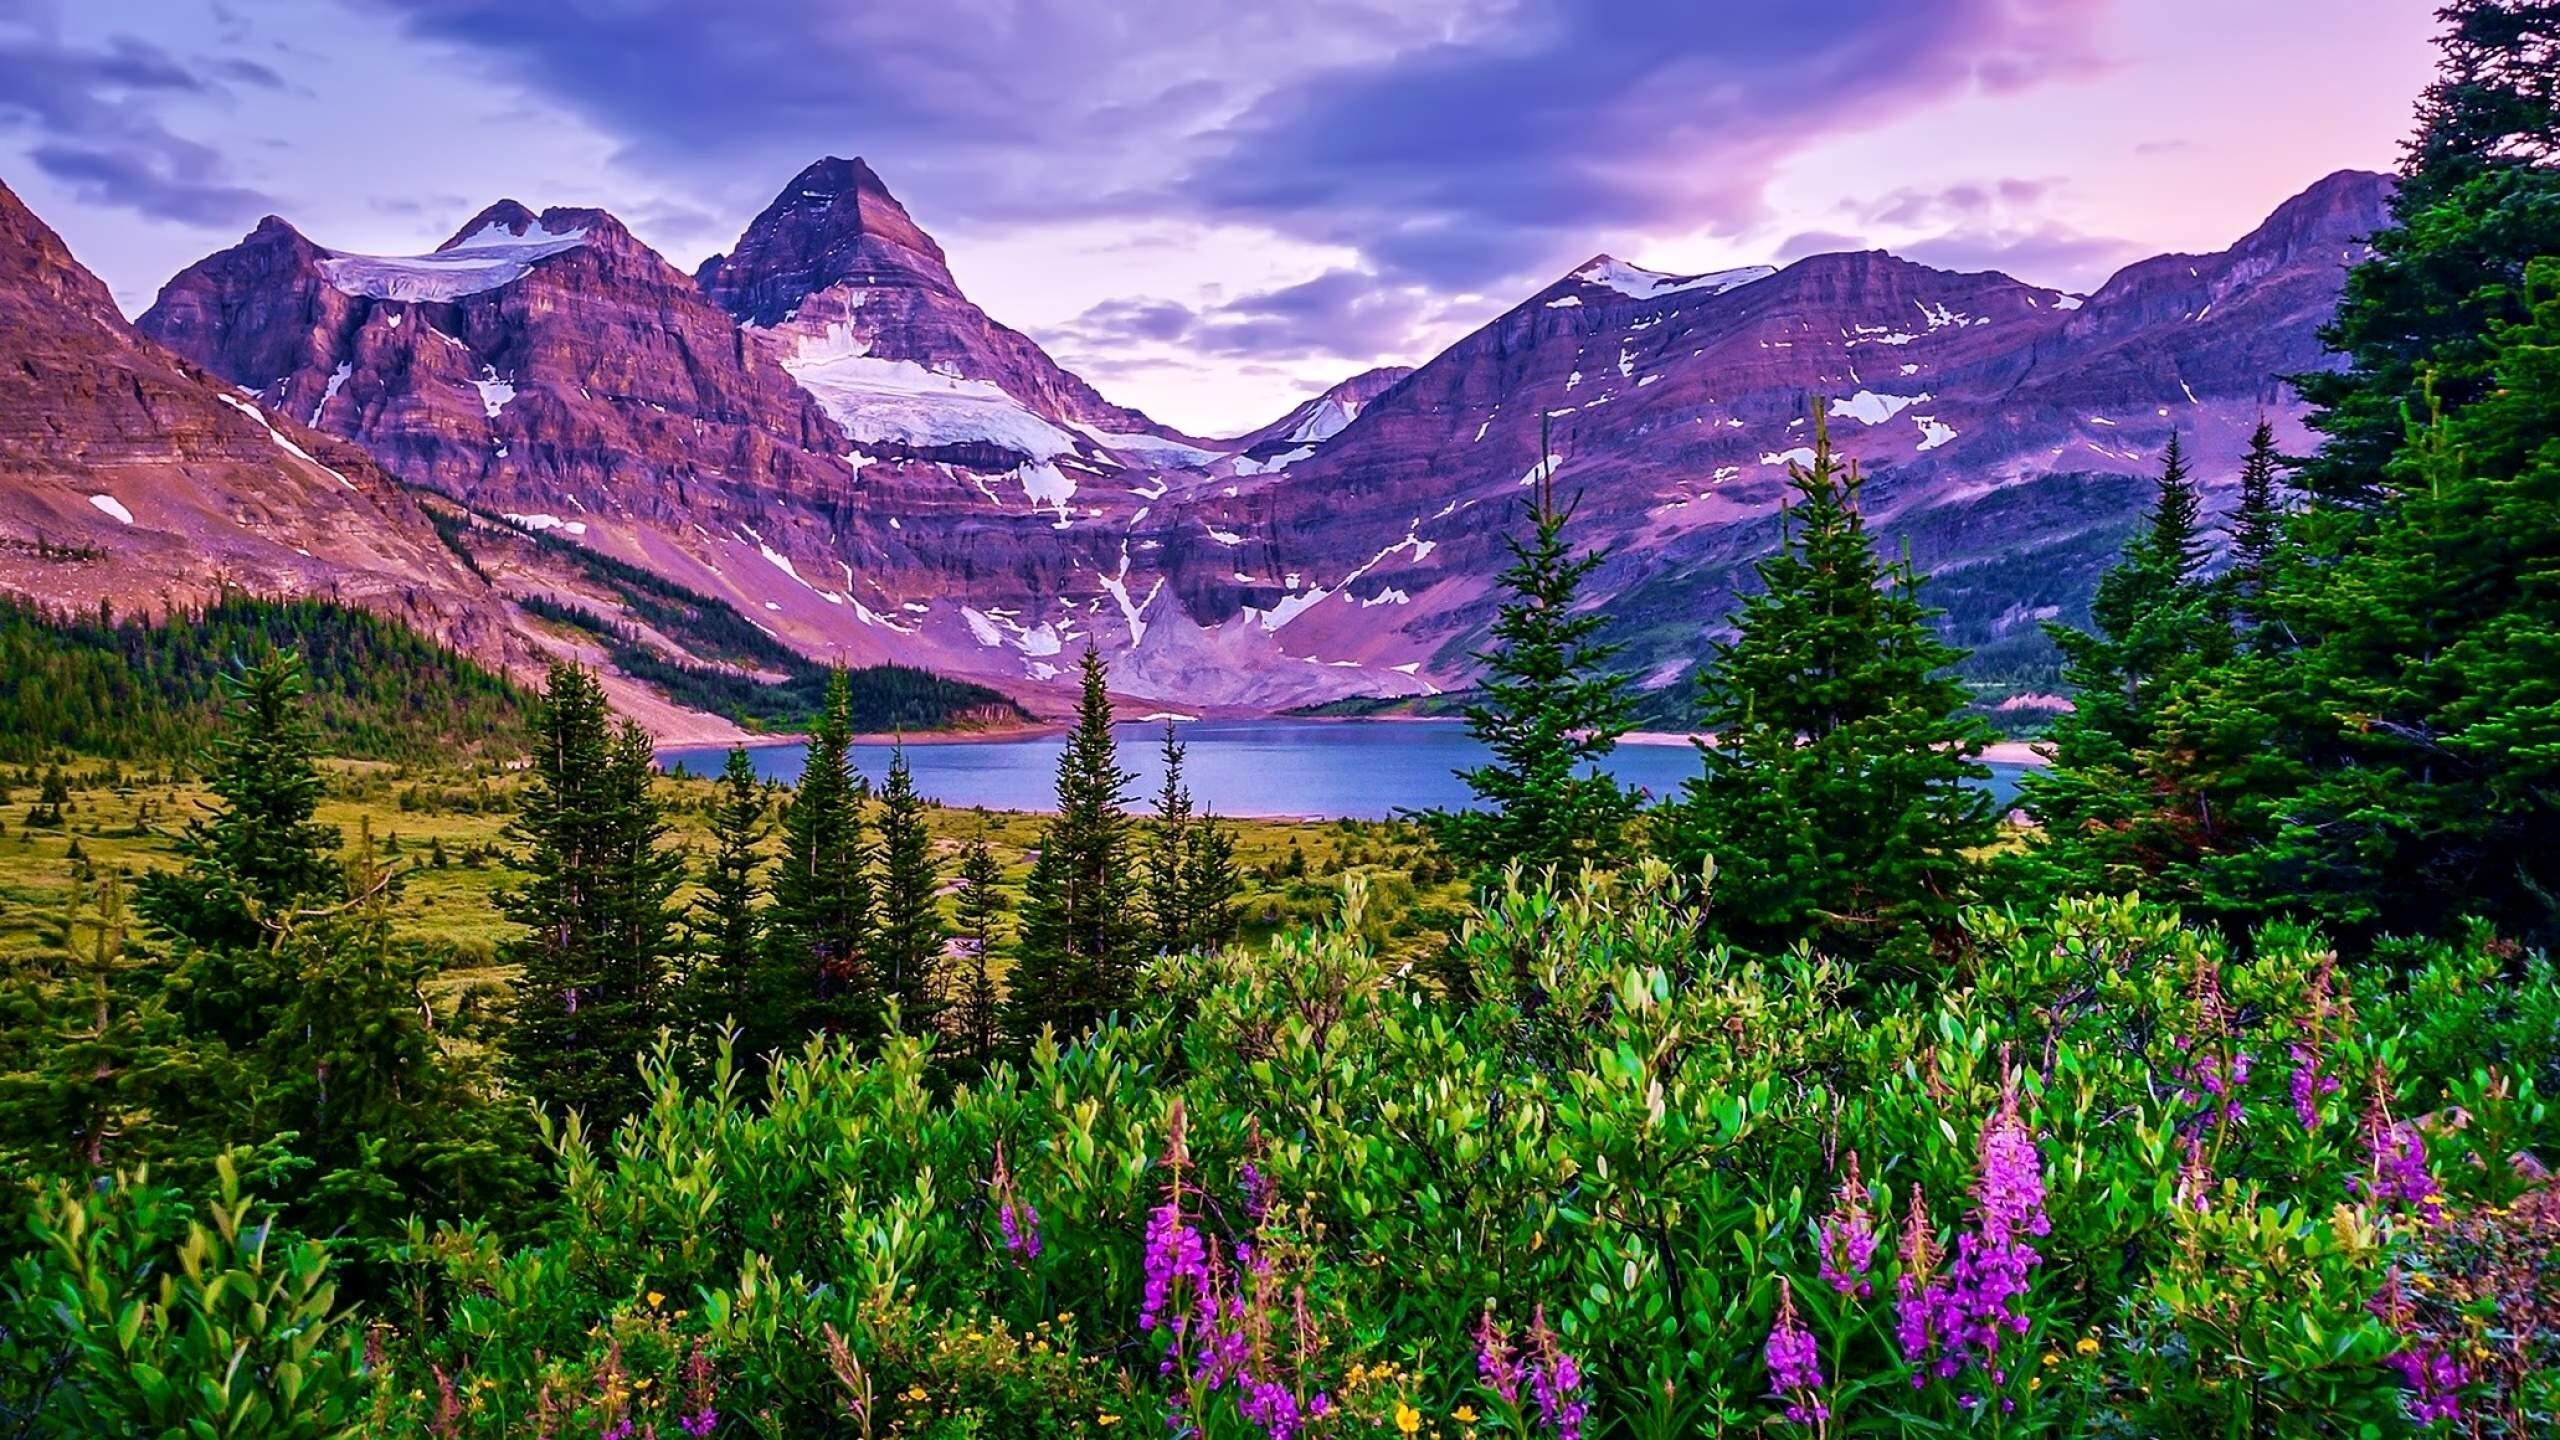 Mountain and Lake 4K Wallpaper HD